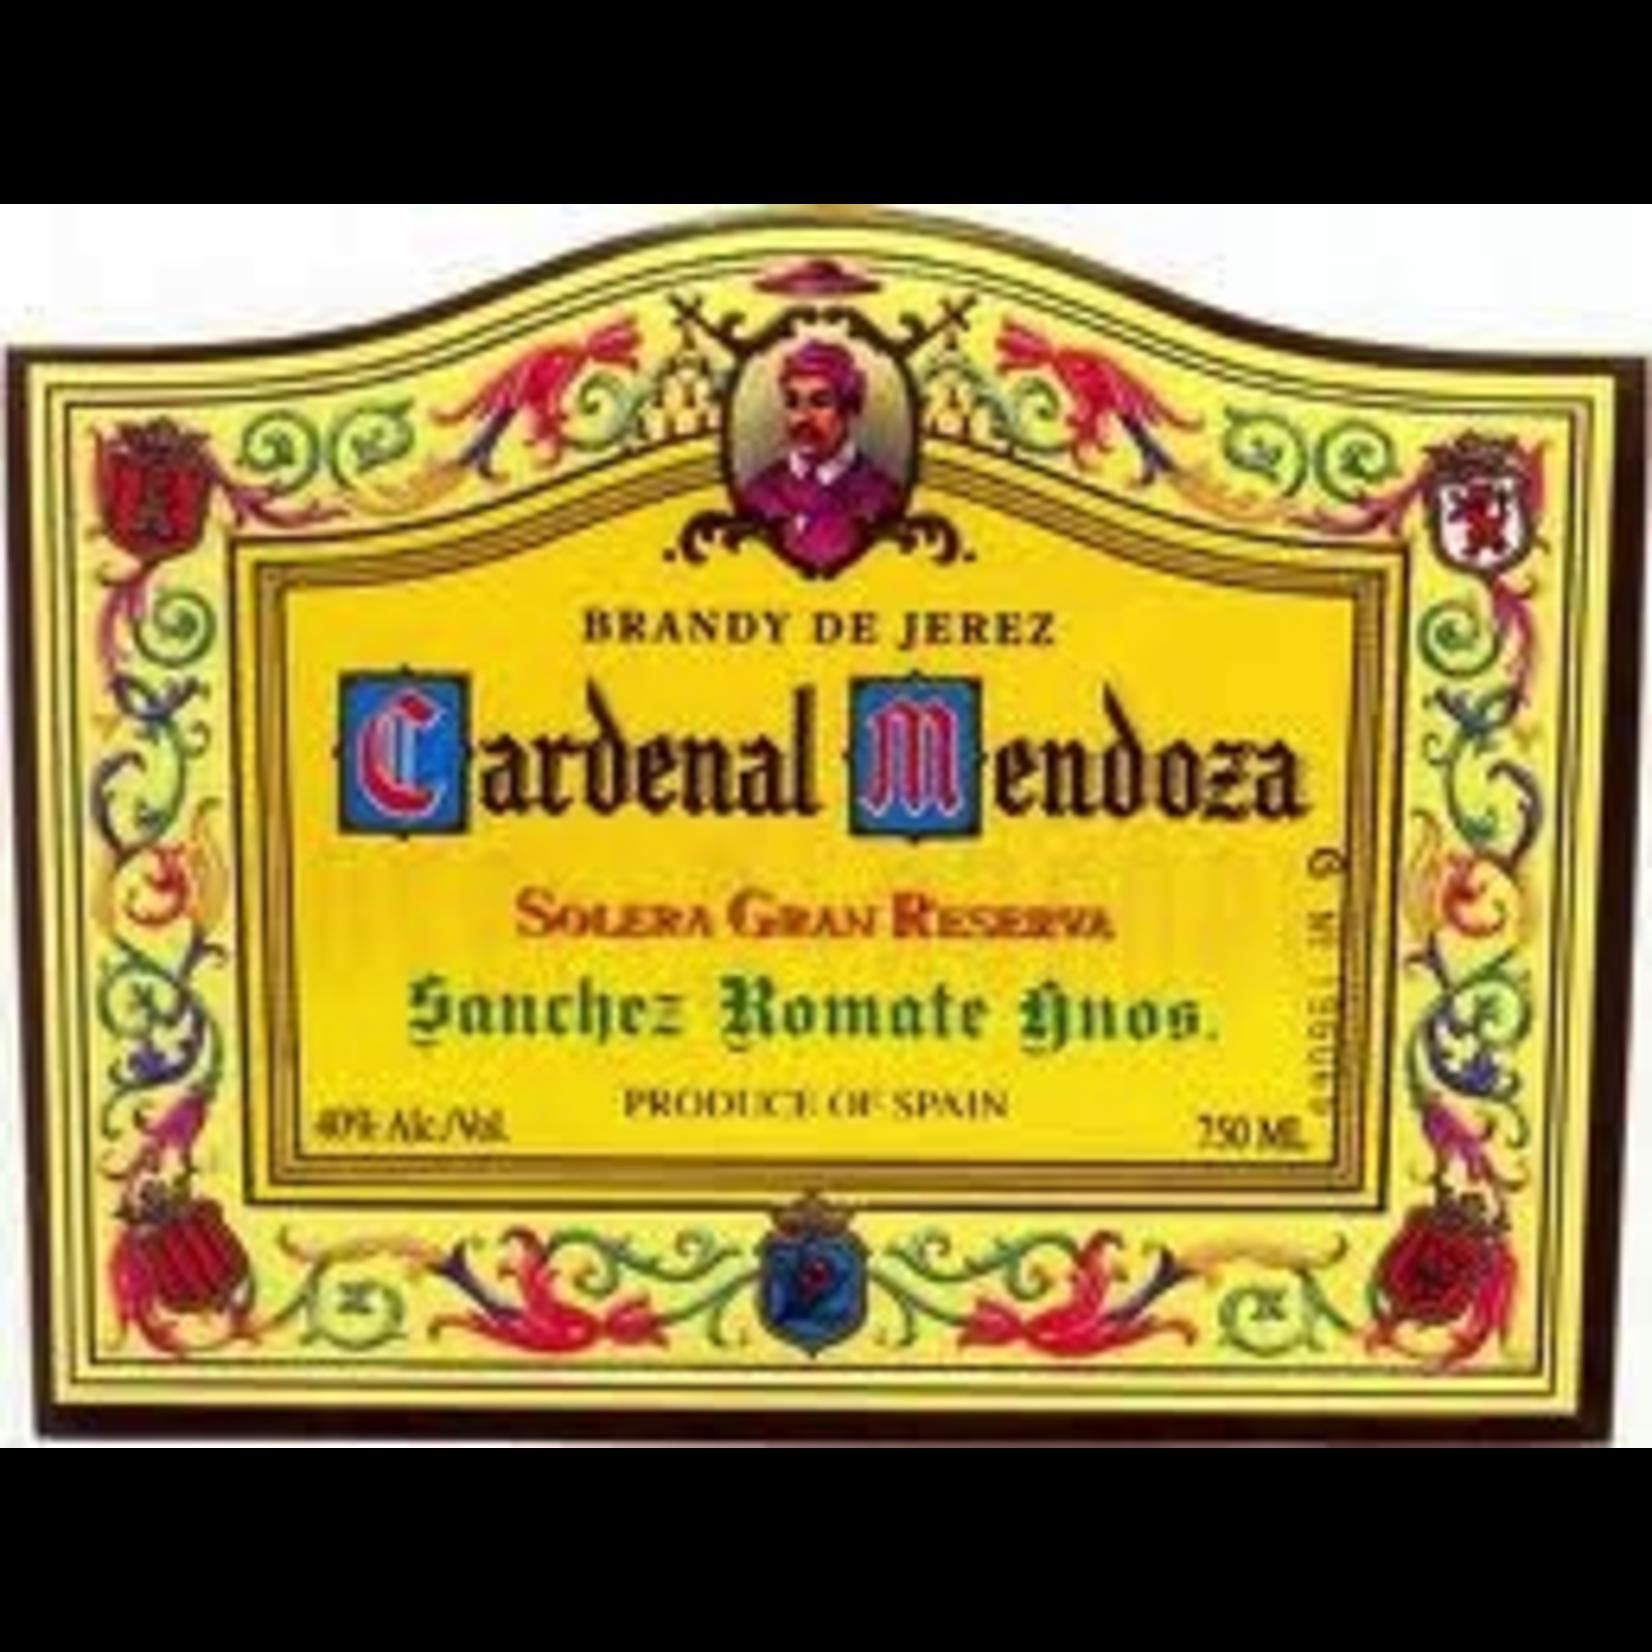 Spirits Cardenal Mendoza Brandy Solera Gran Reserva 80